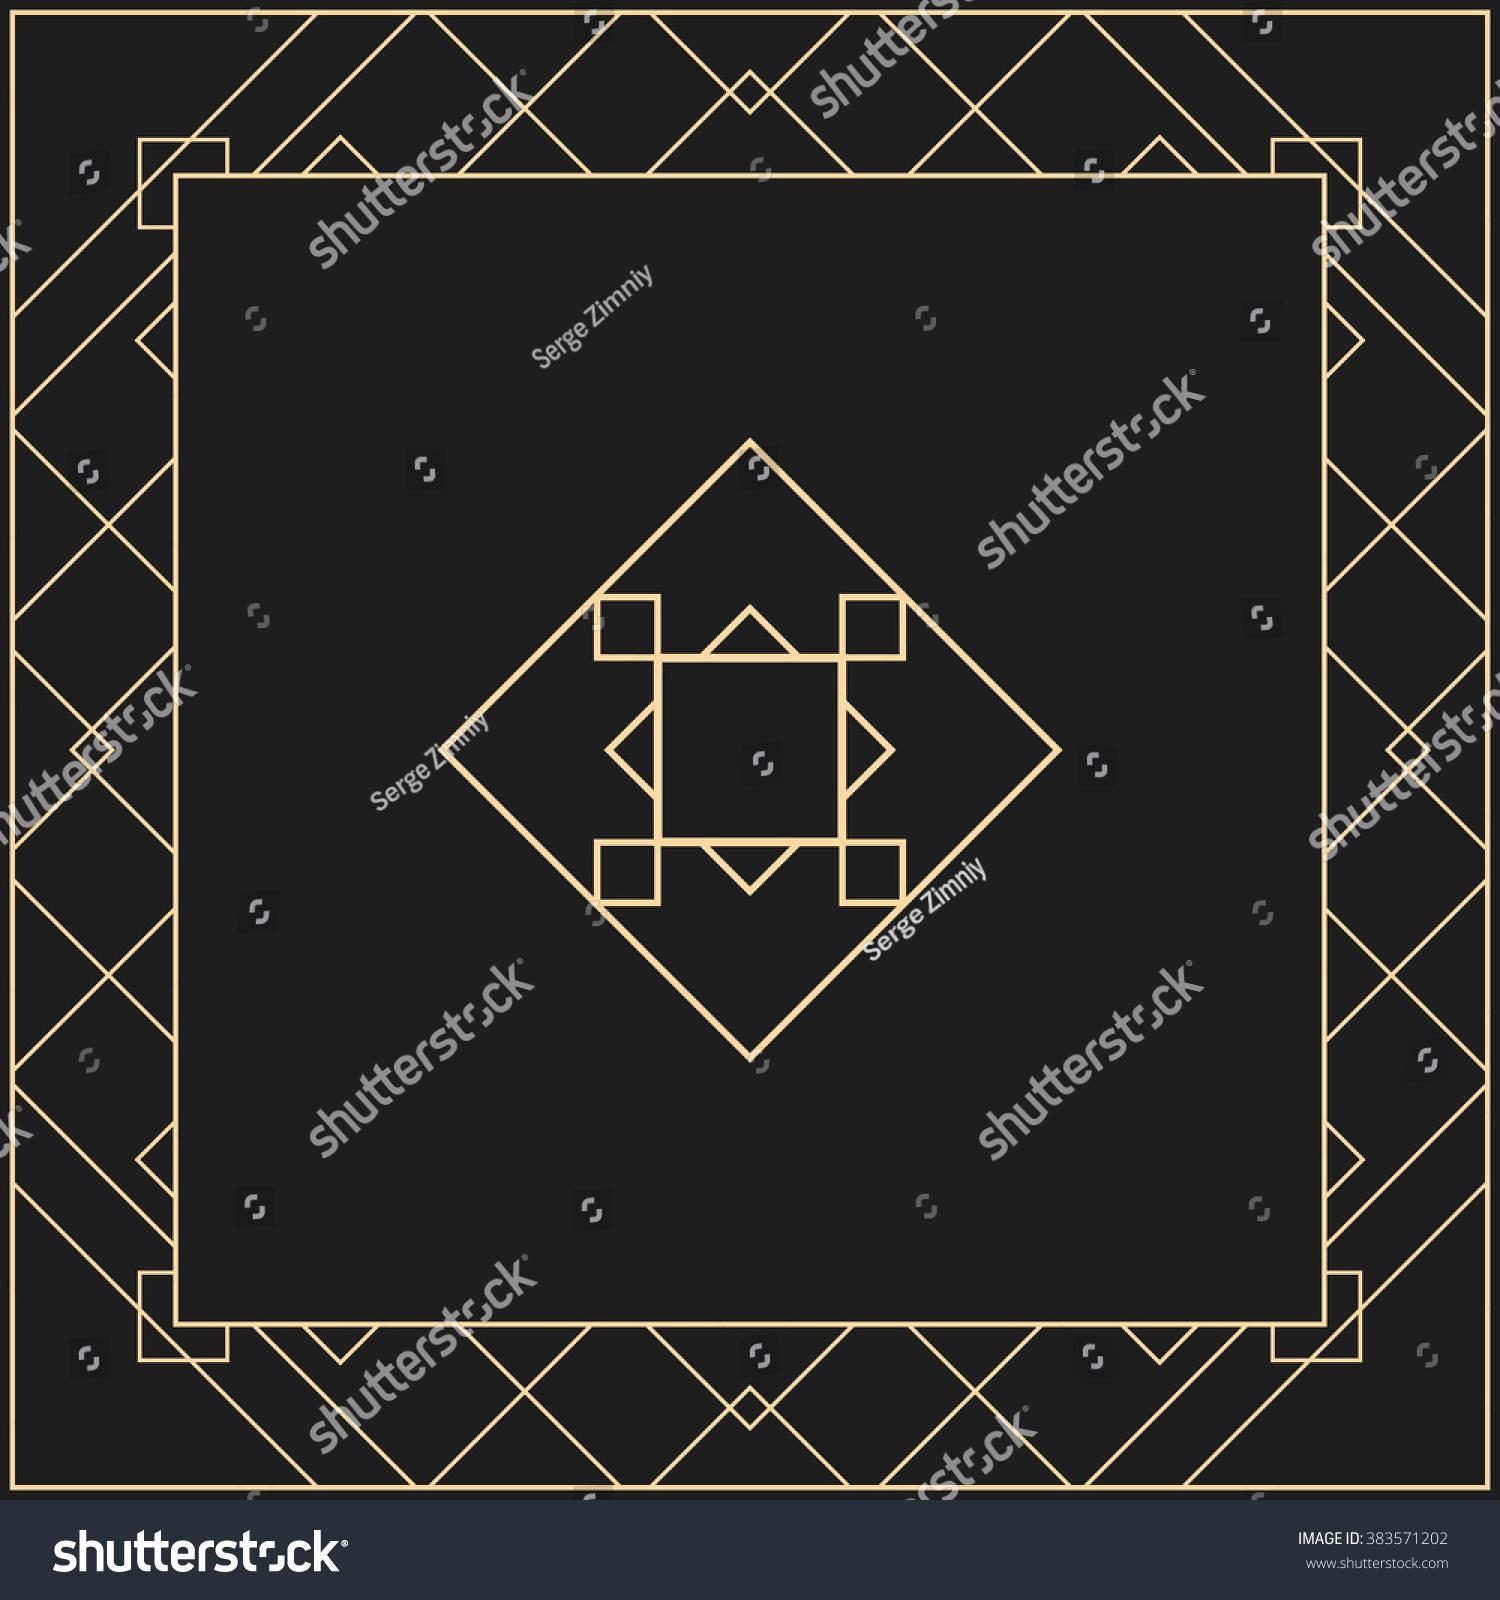 vector geometric frame art deco style stock vector 383571202 shutterstock. Black Bedroom Furniture Sets. Home Design Ideas